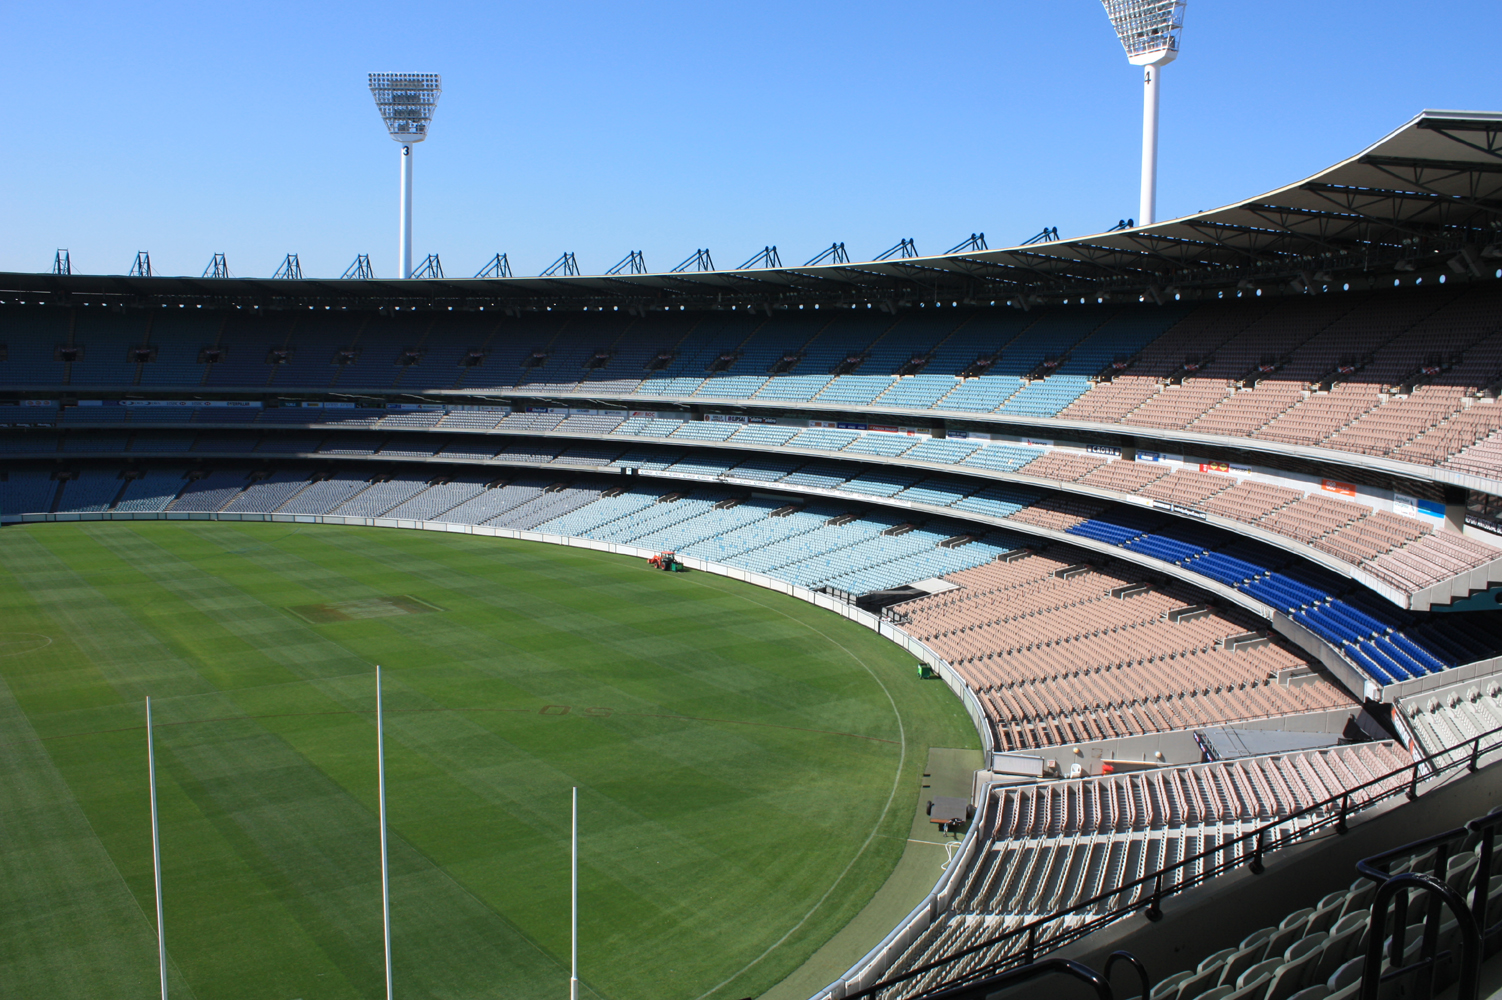 Melbourne Cricket Ground Tour